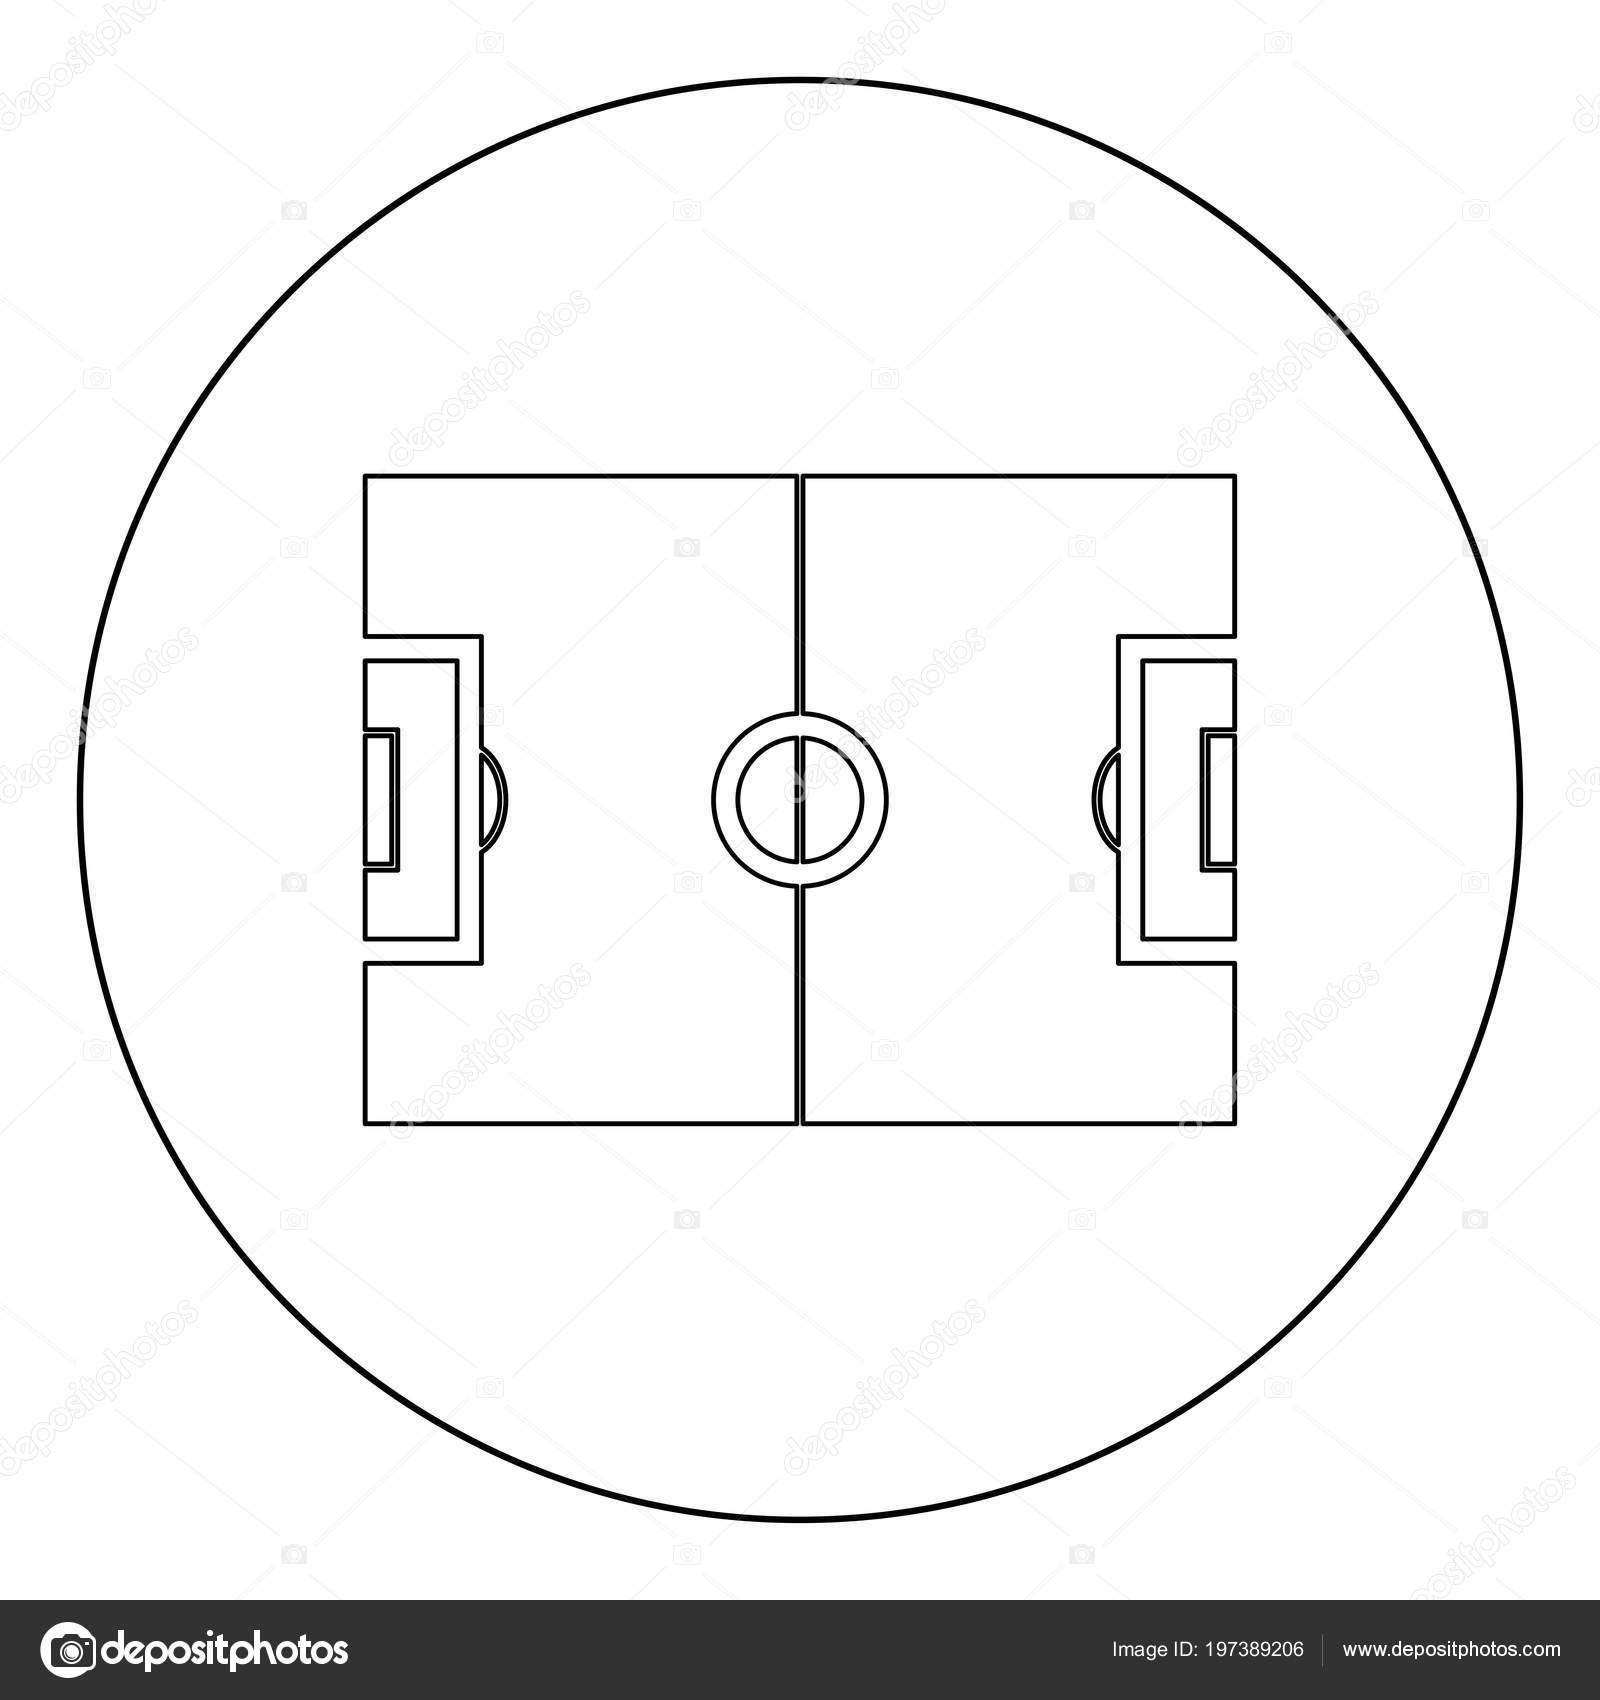 Fussball Feld Symbol Umriss Schwarze Farbe Kreis Vektor